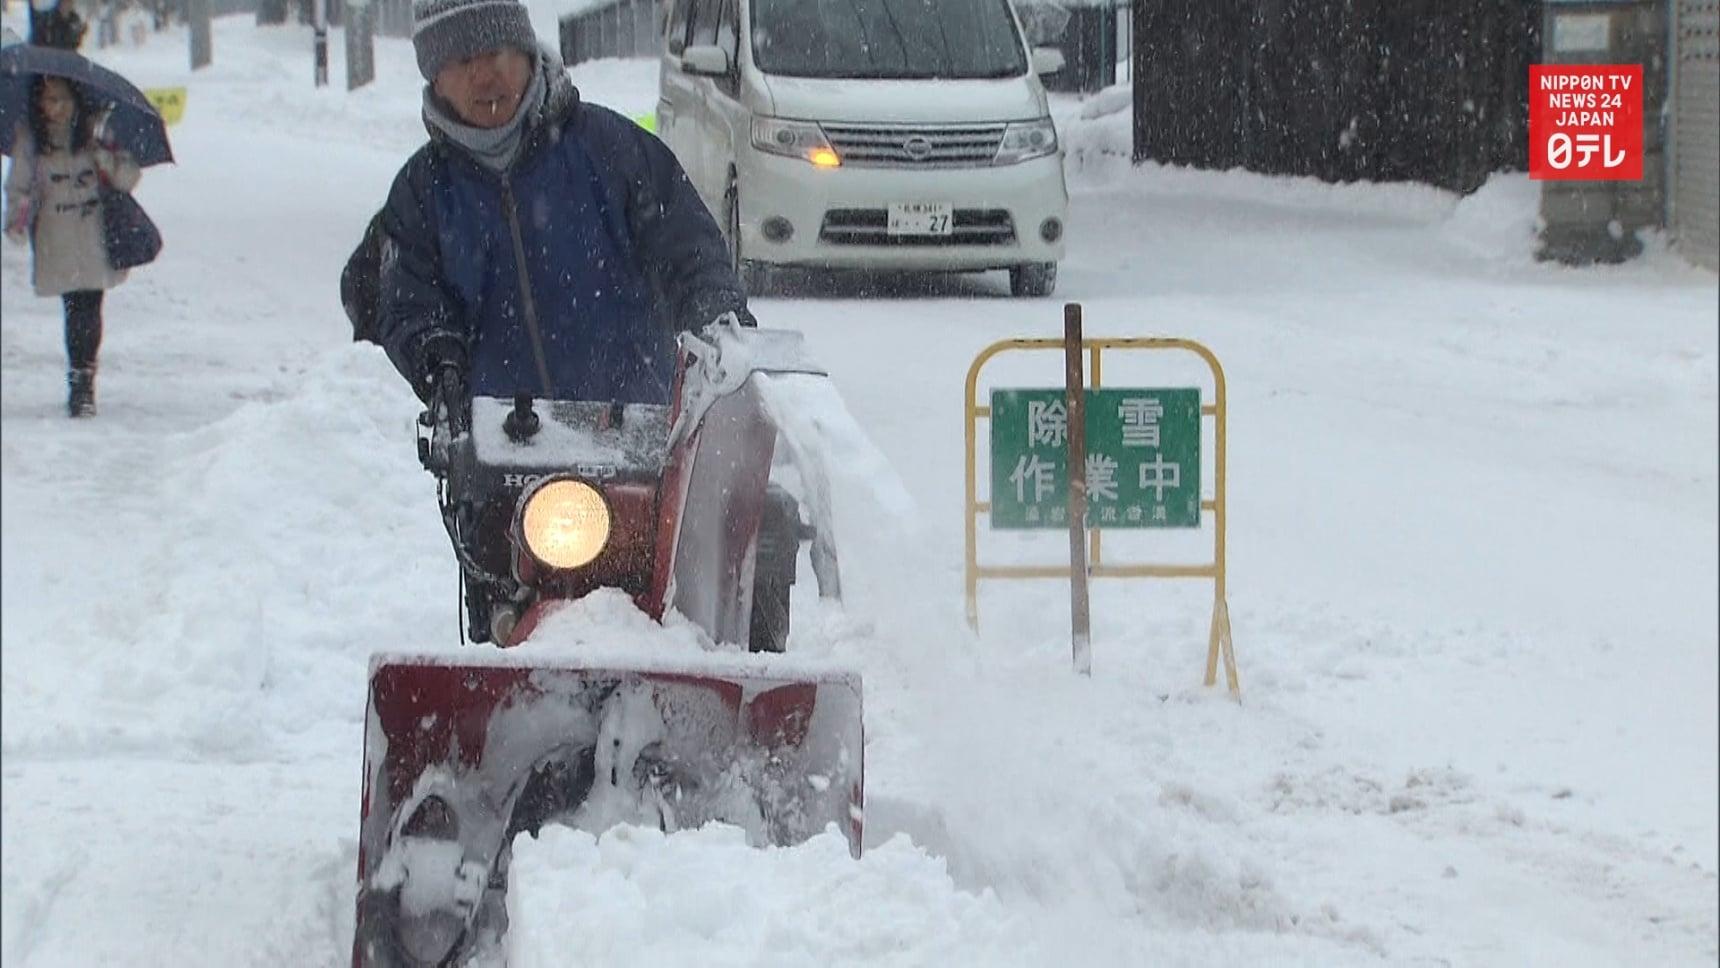 Hokkaido Receives Largest Snowfall This Winter